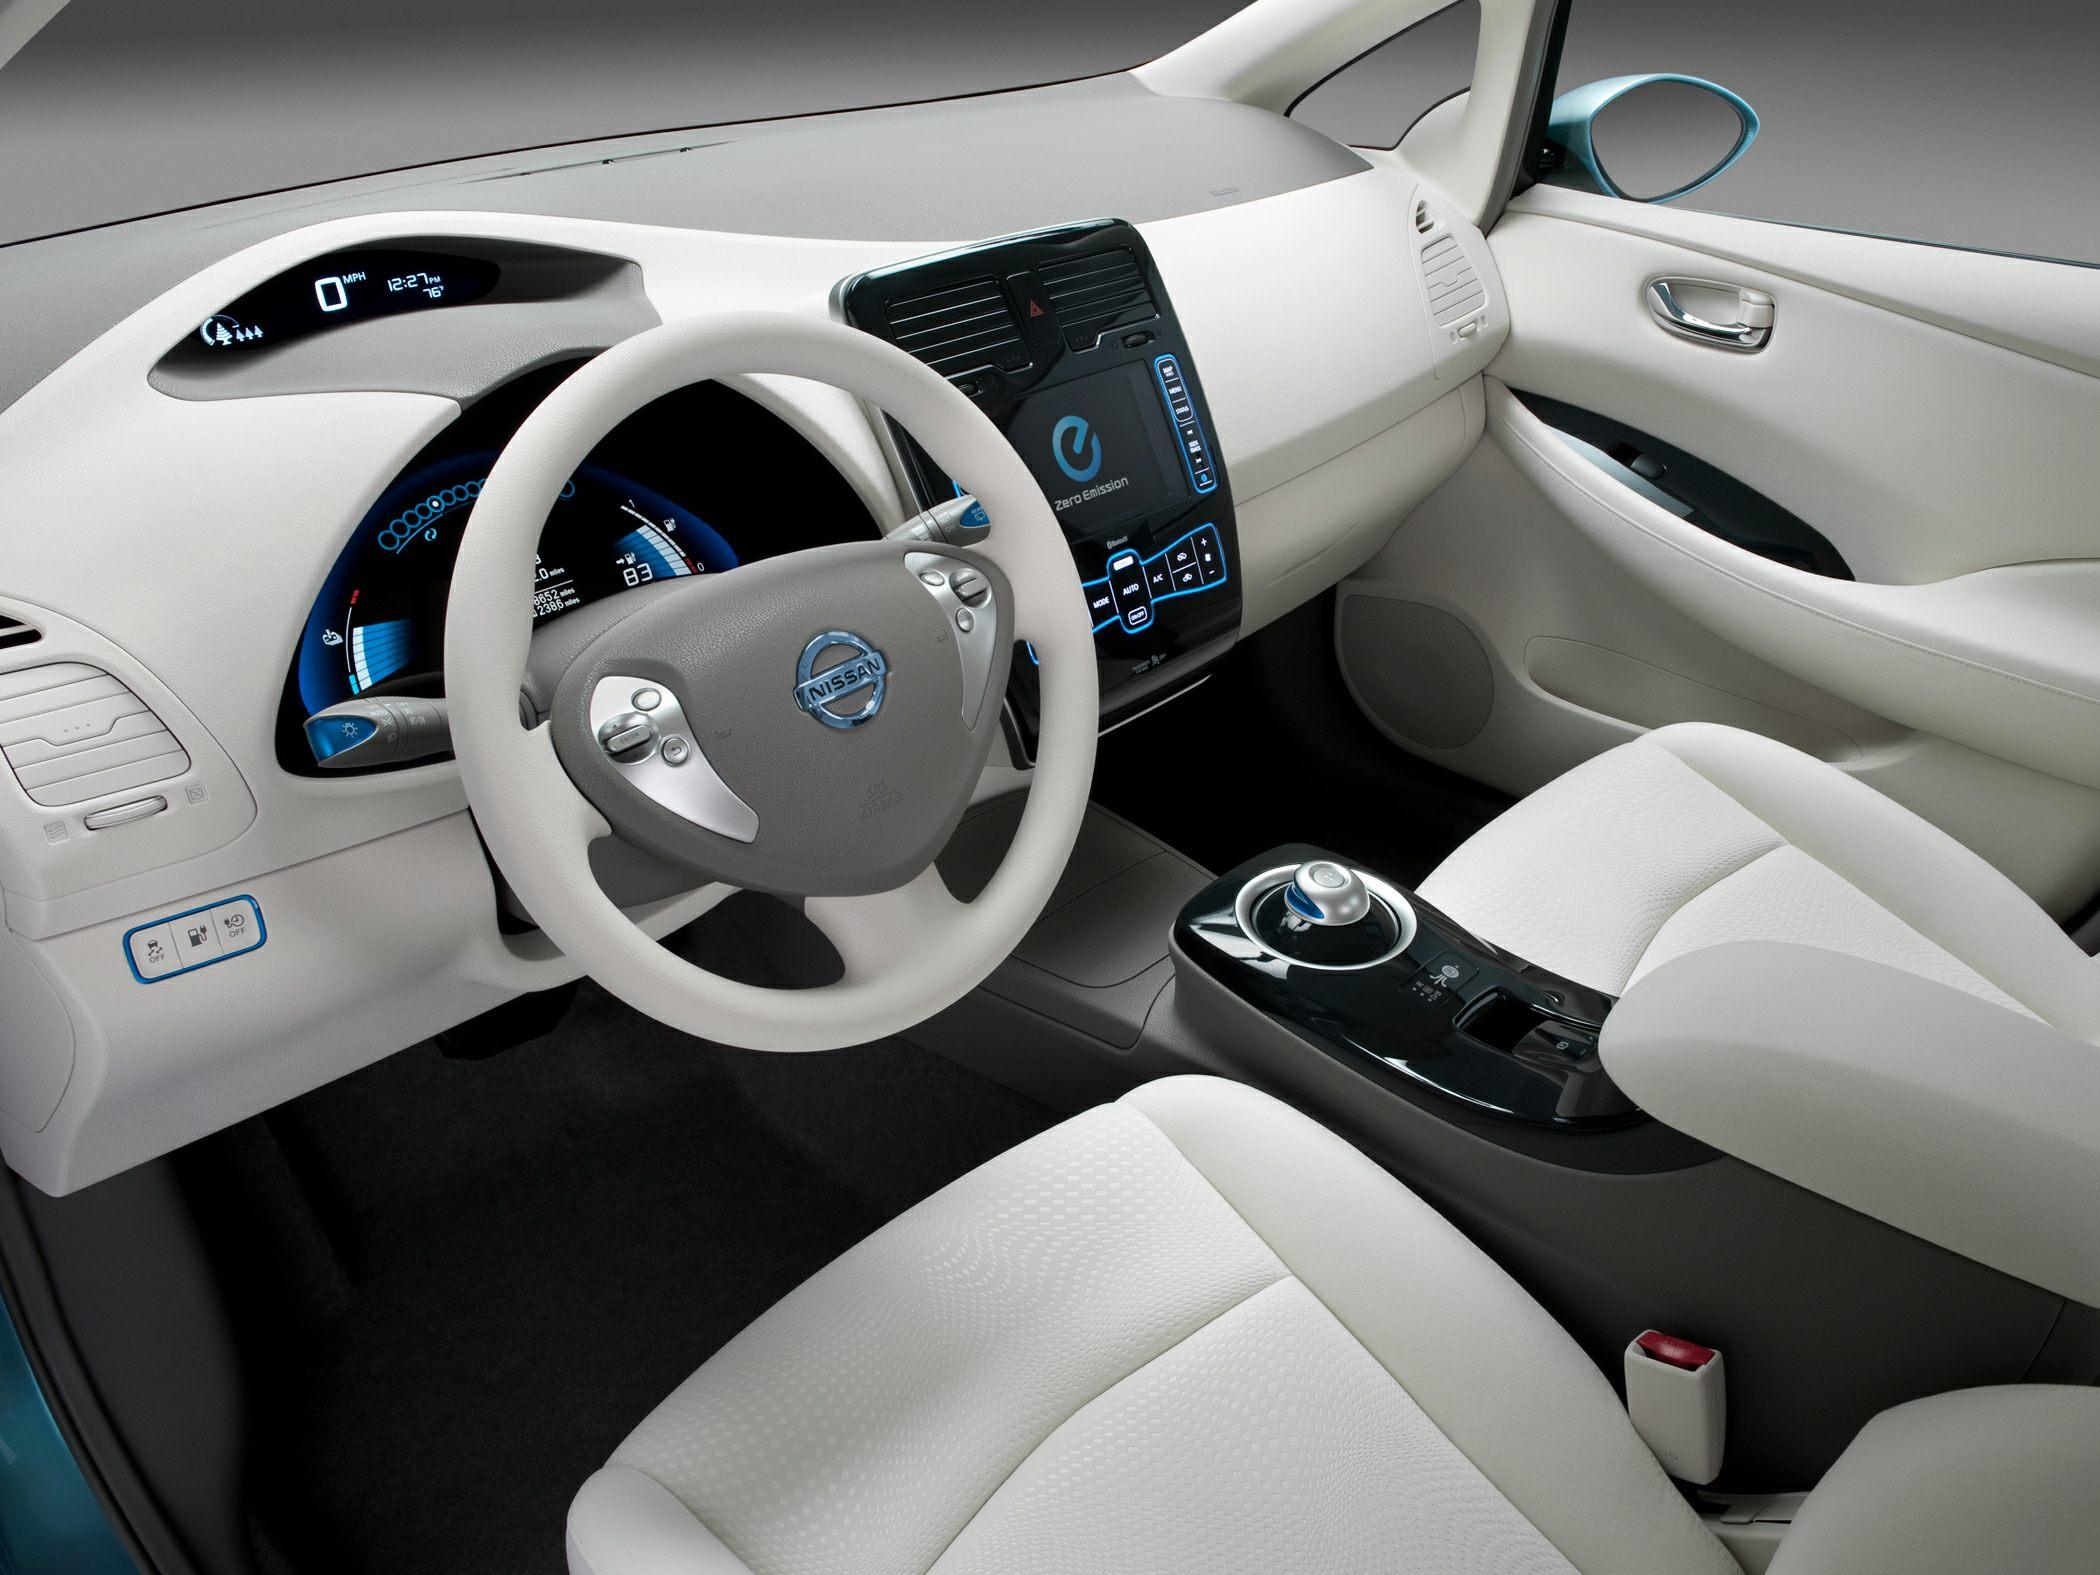 Nissan Leaf Lease >> 2017 Nissan Leaf Deals Prices Incentives Leases Overview